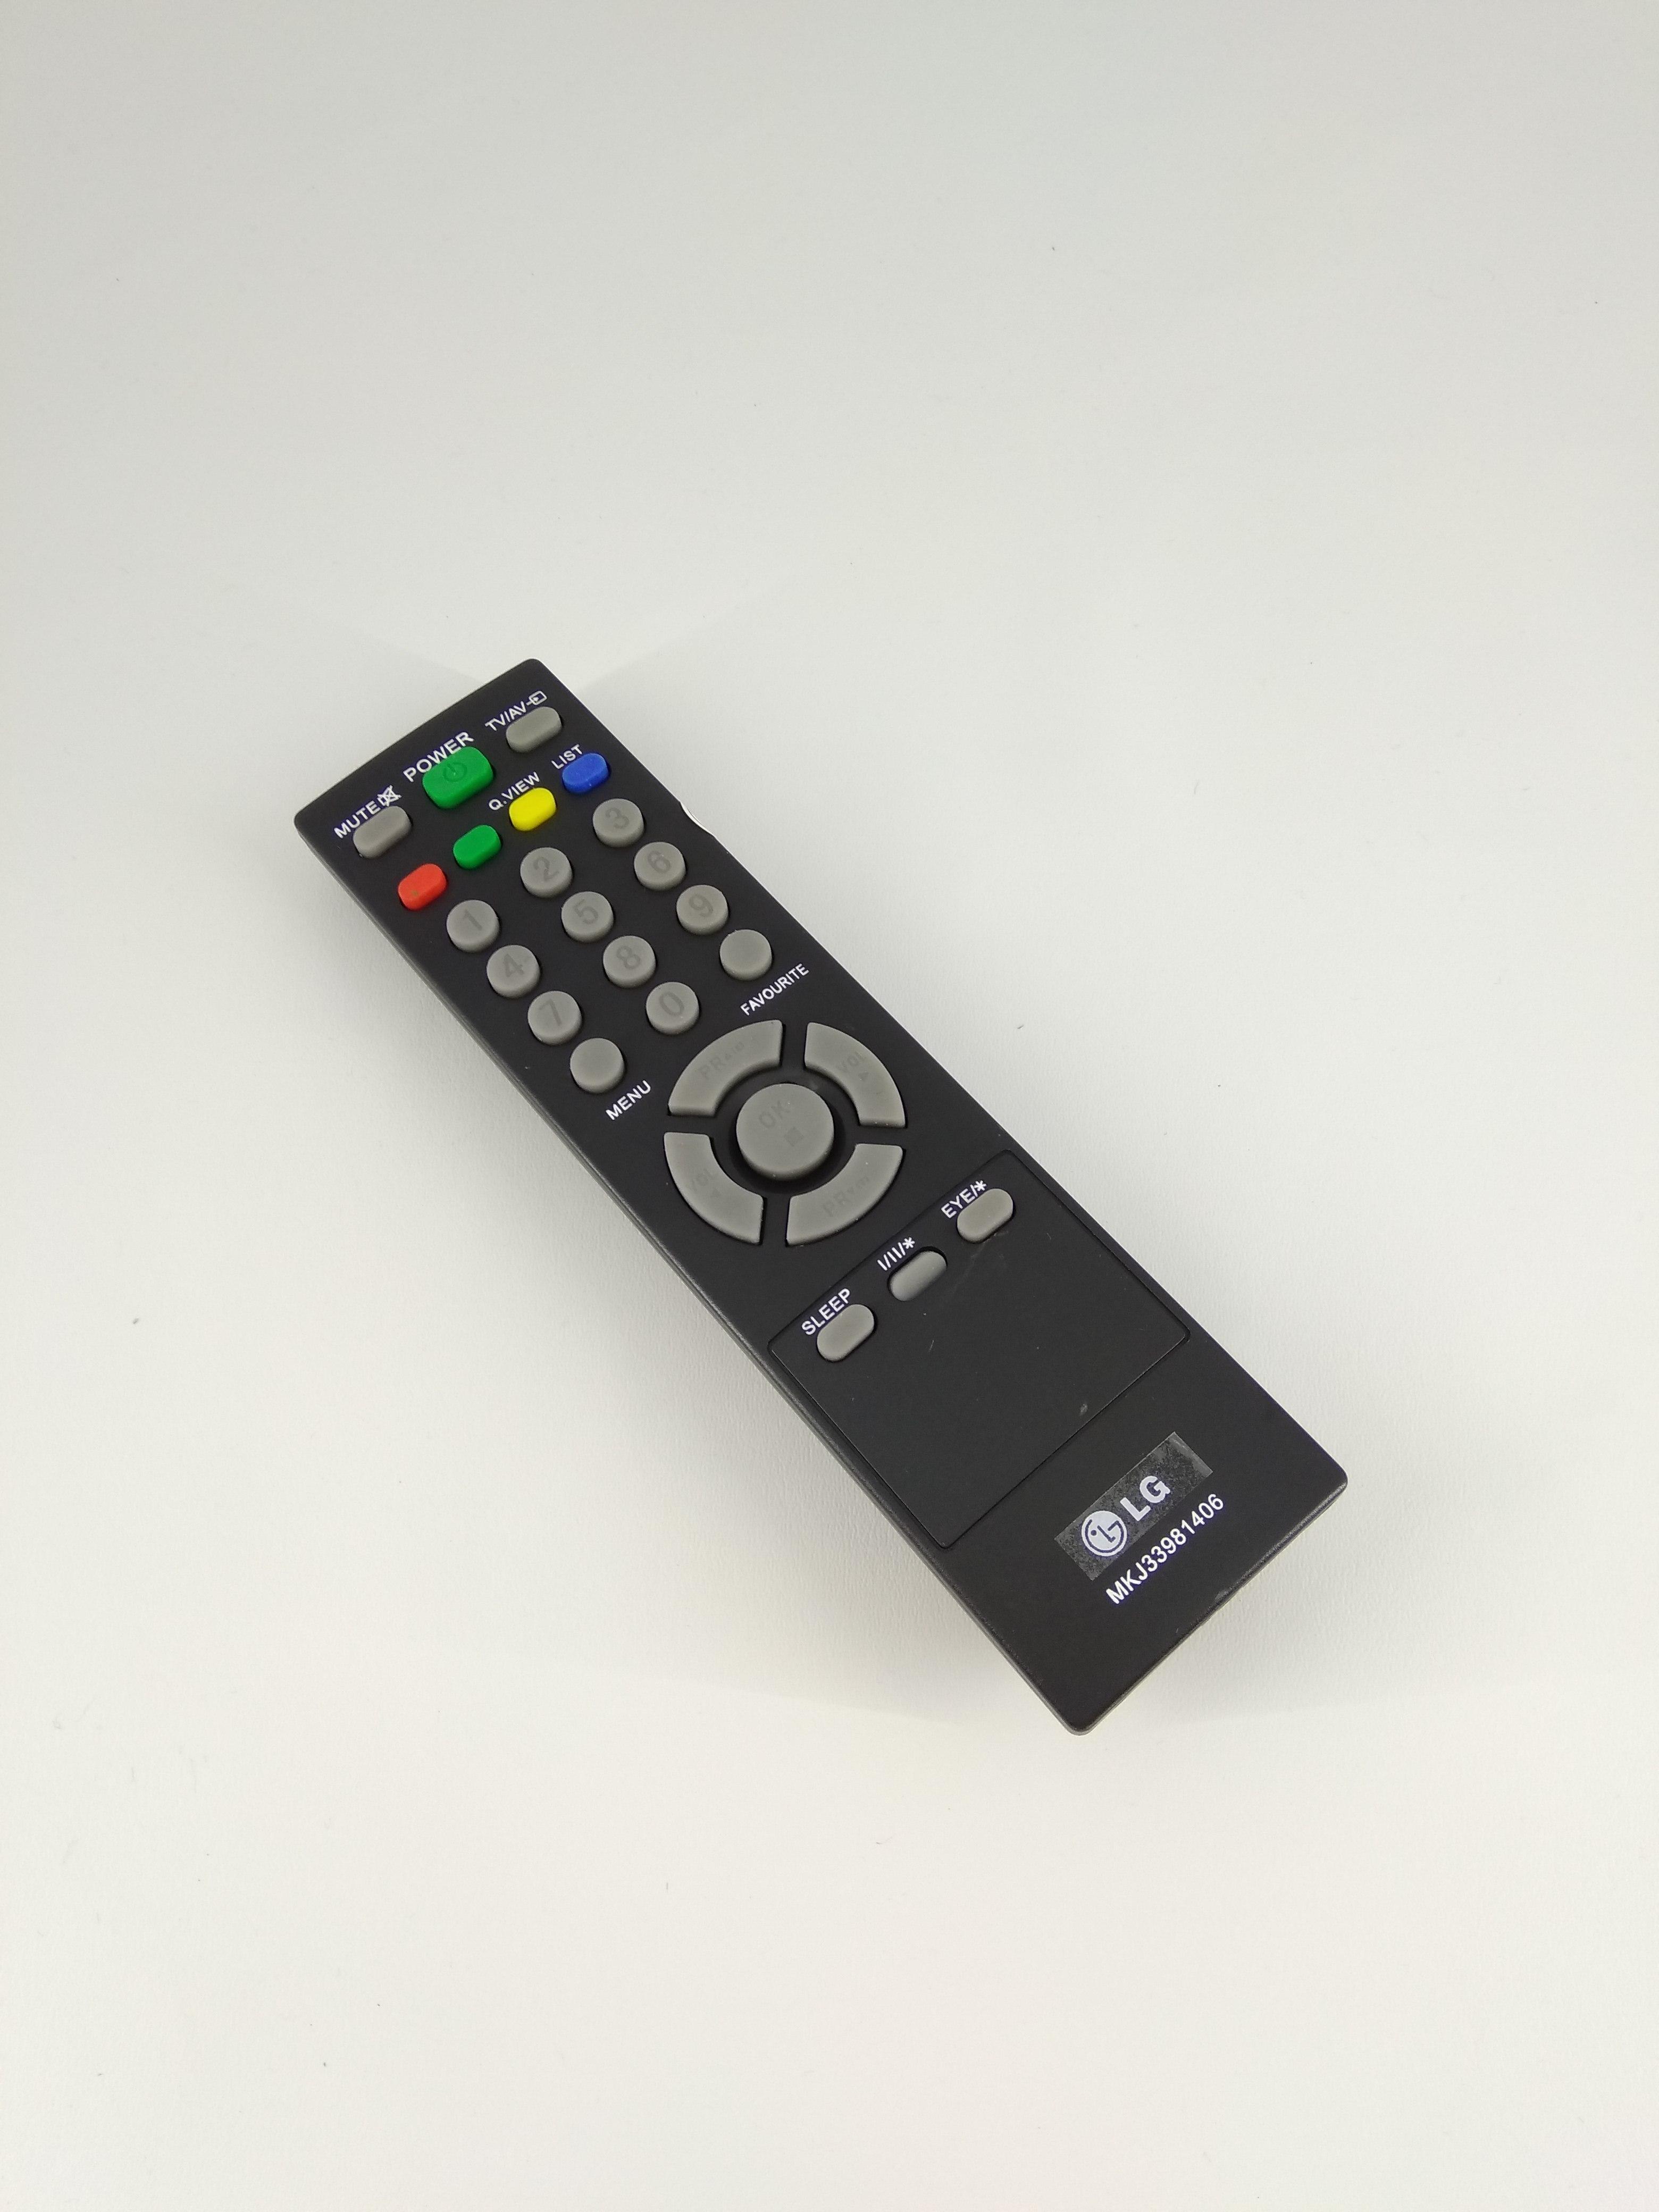 Remot Remote TV LG Blackpearl Tabung Slim Flat LCD MKJ33981406 Original Pabrik / KW